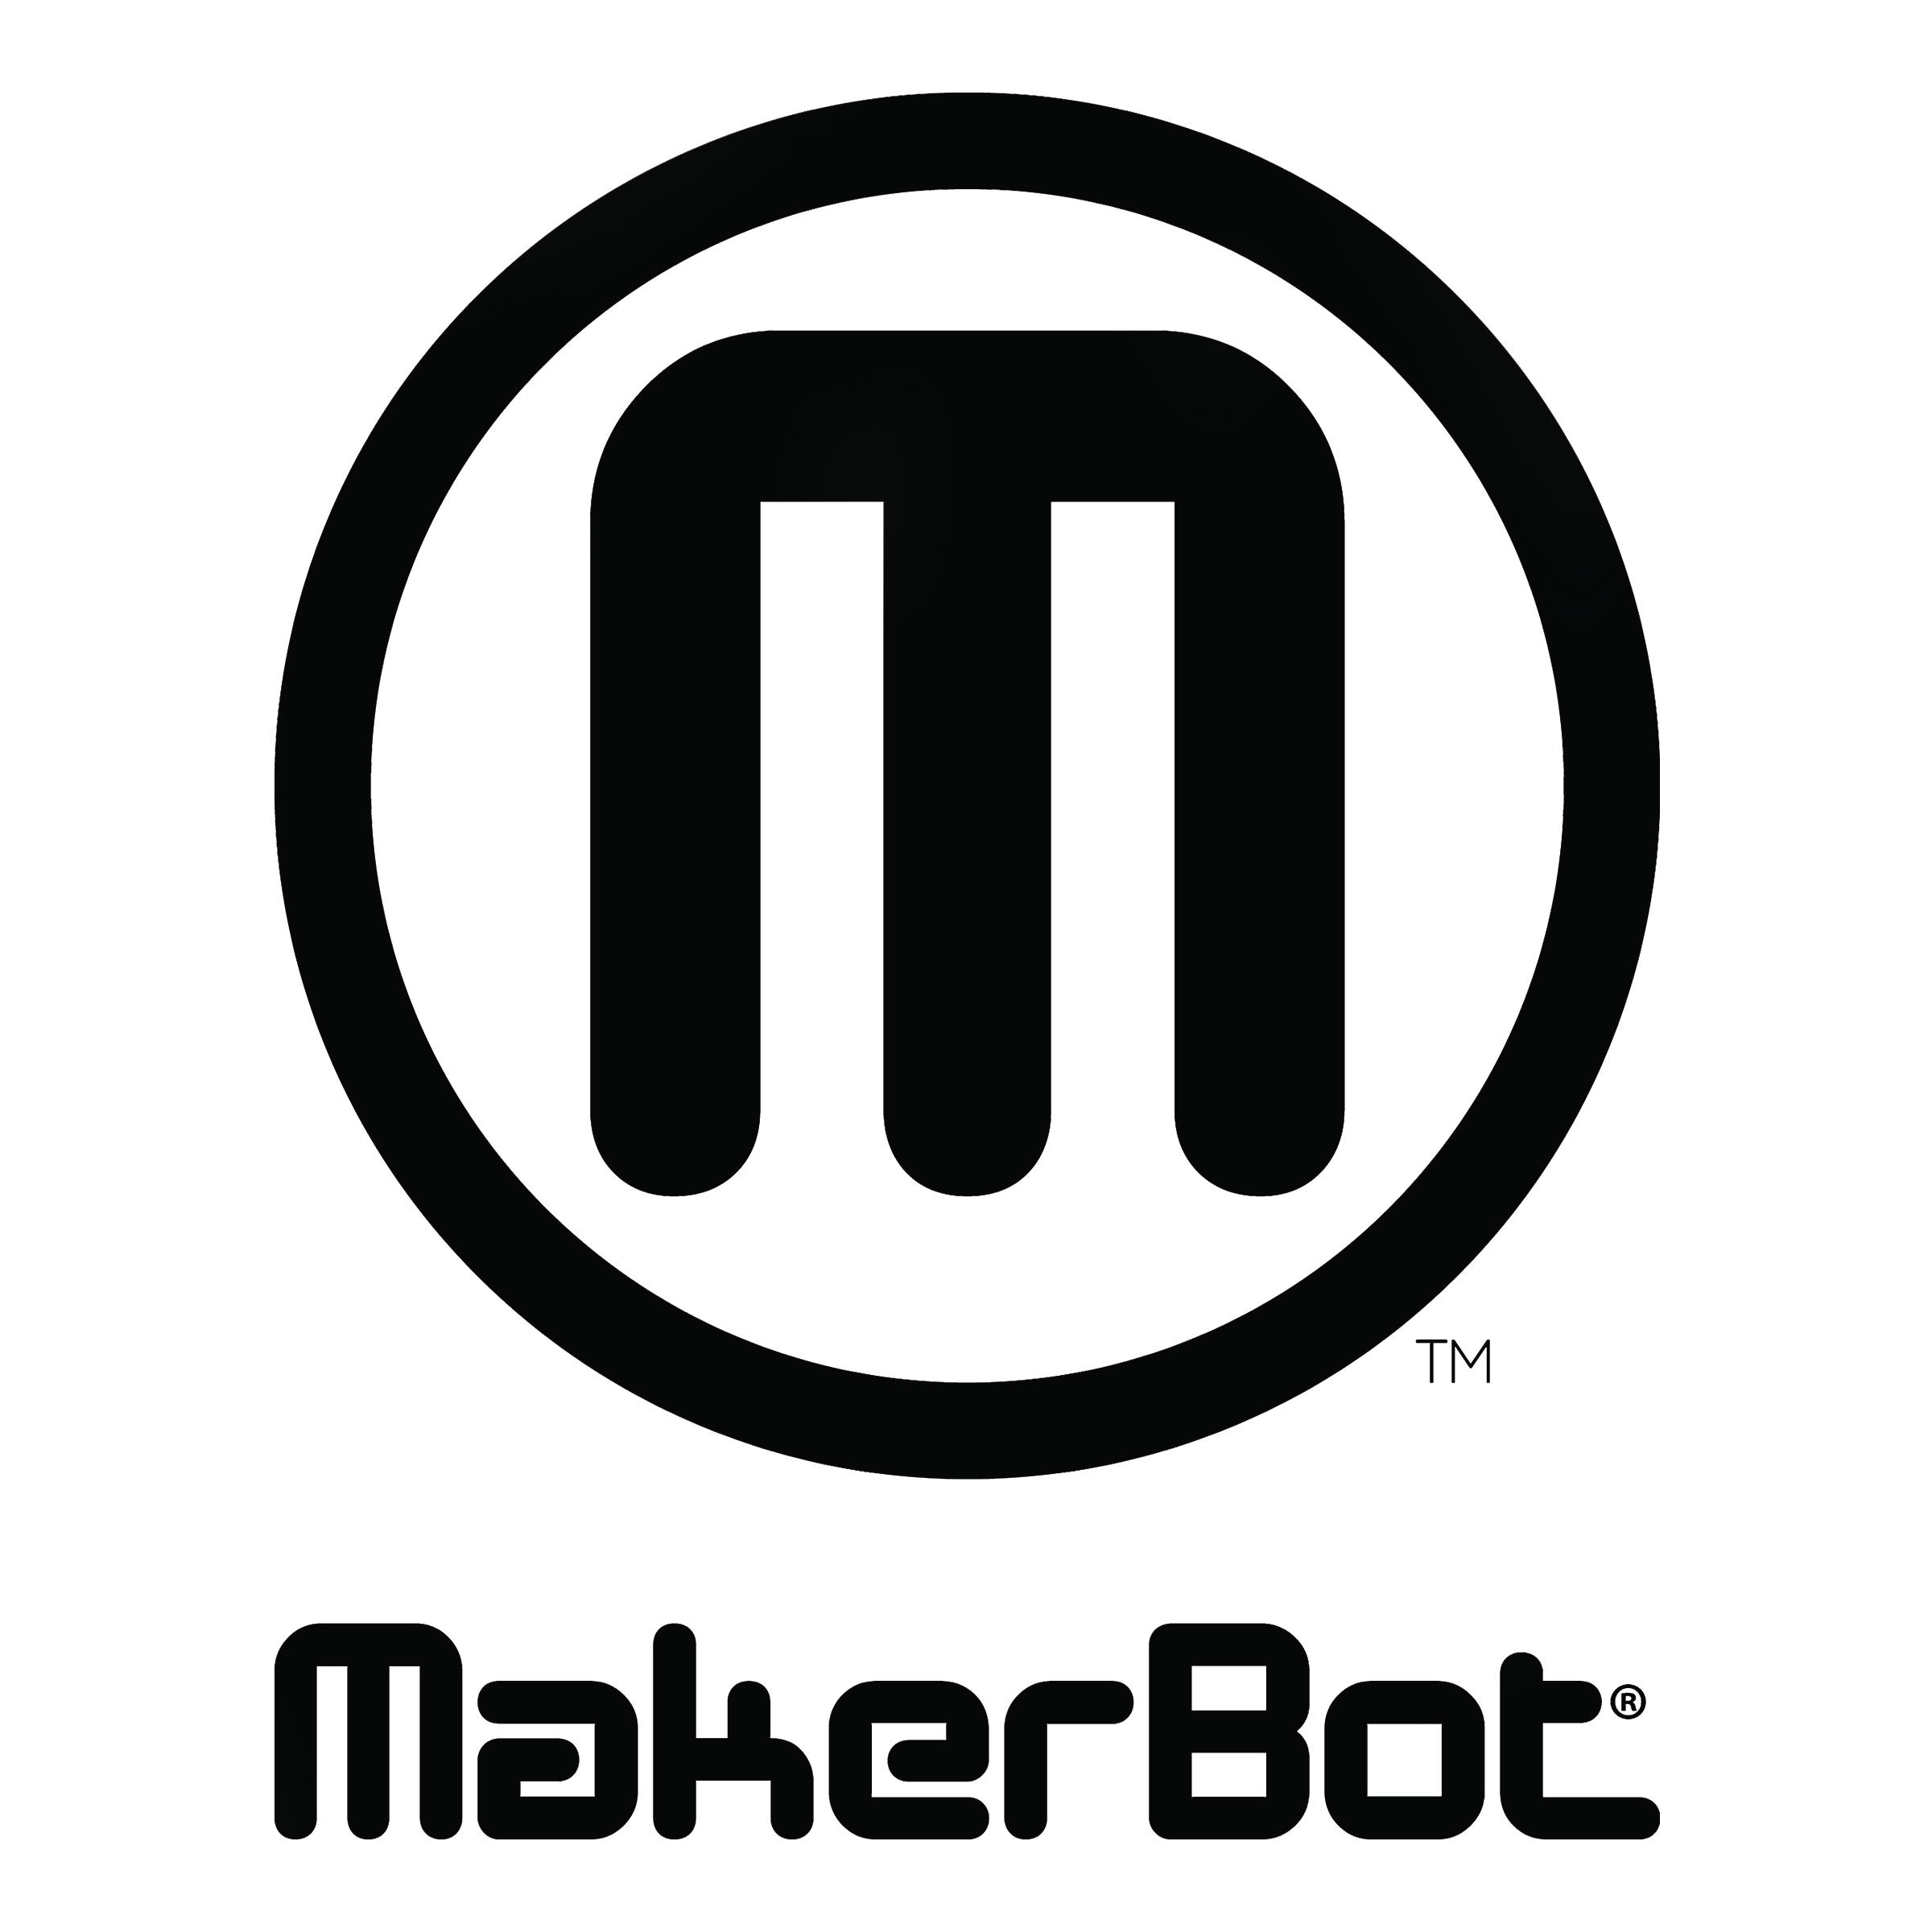 MB_logo_vertical_K_(1) copy.jpg